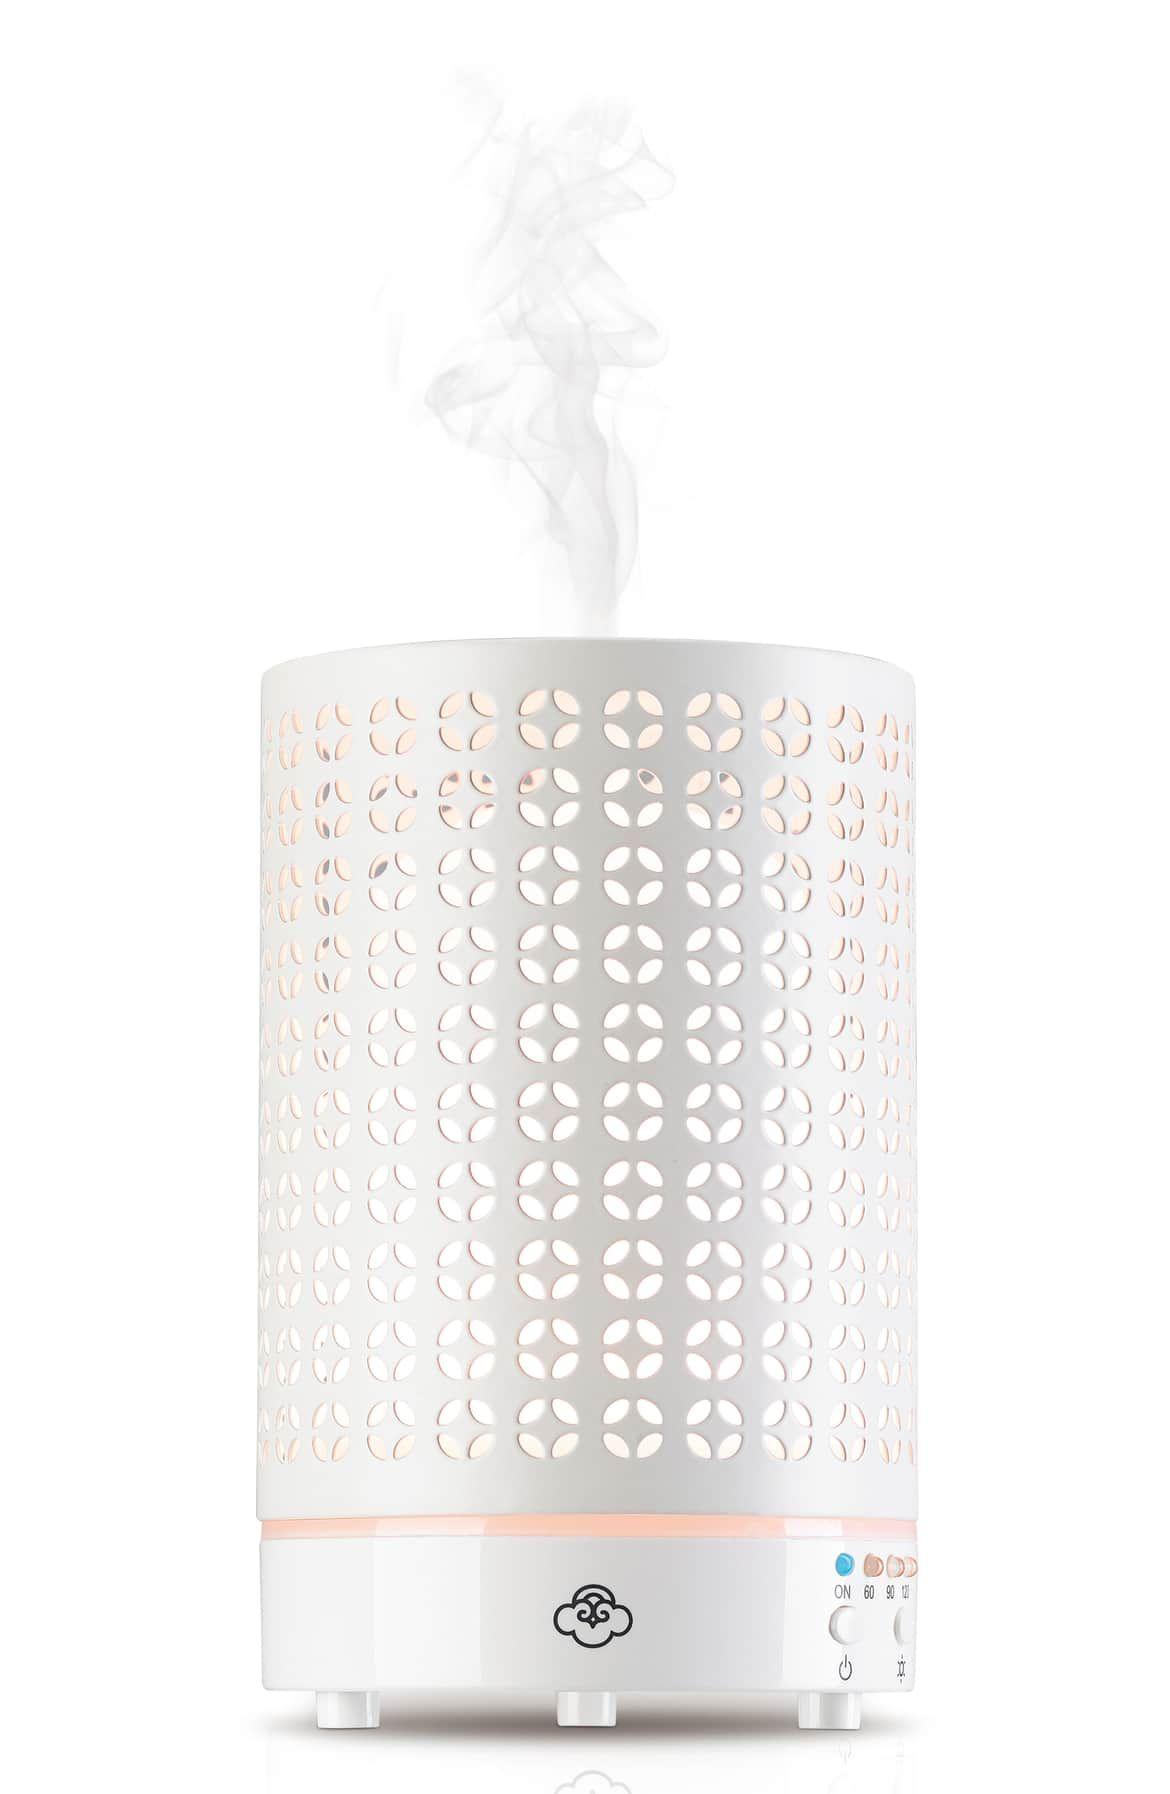 Serene House Cool Mist Cosmos Scentilizer Ultrasonic Aroma